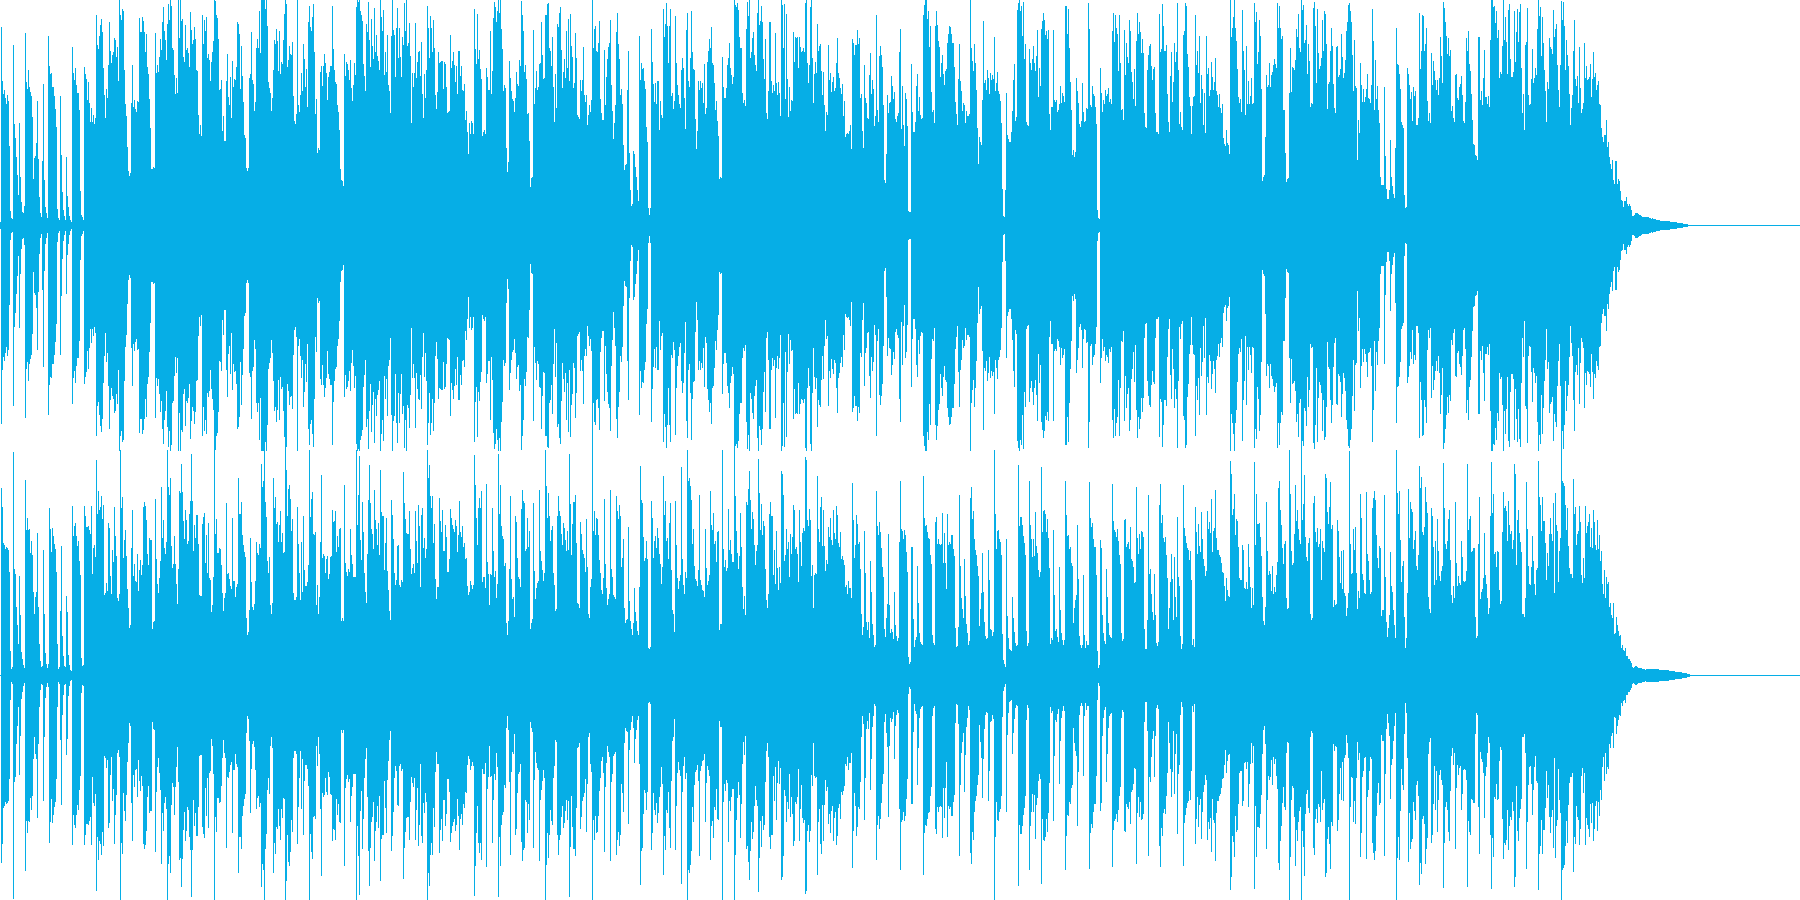 Coolかっこいい脳内エレクトロサウンドの再生済みの波形